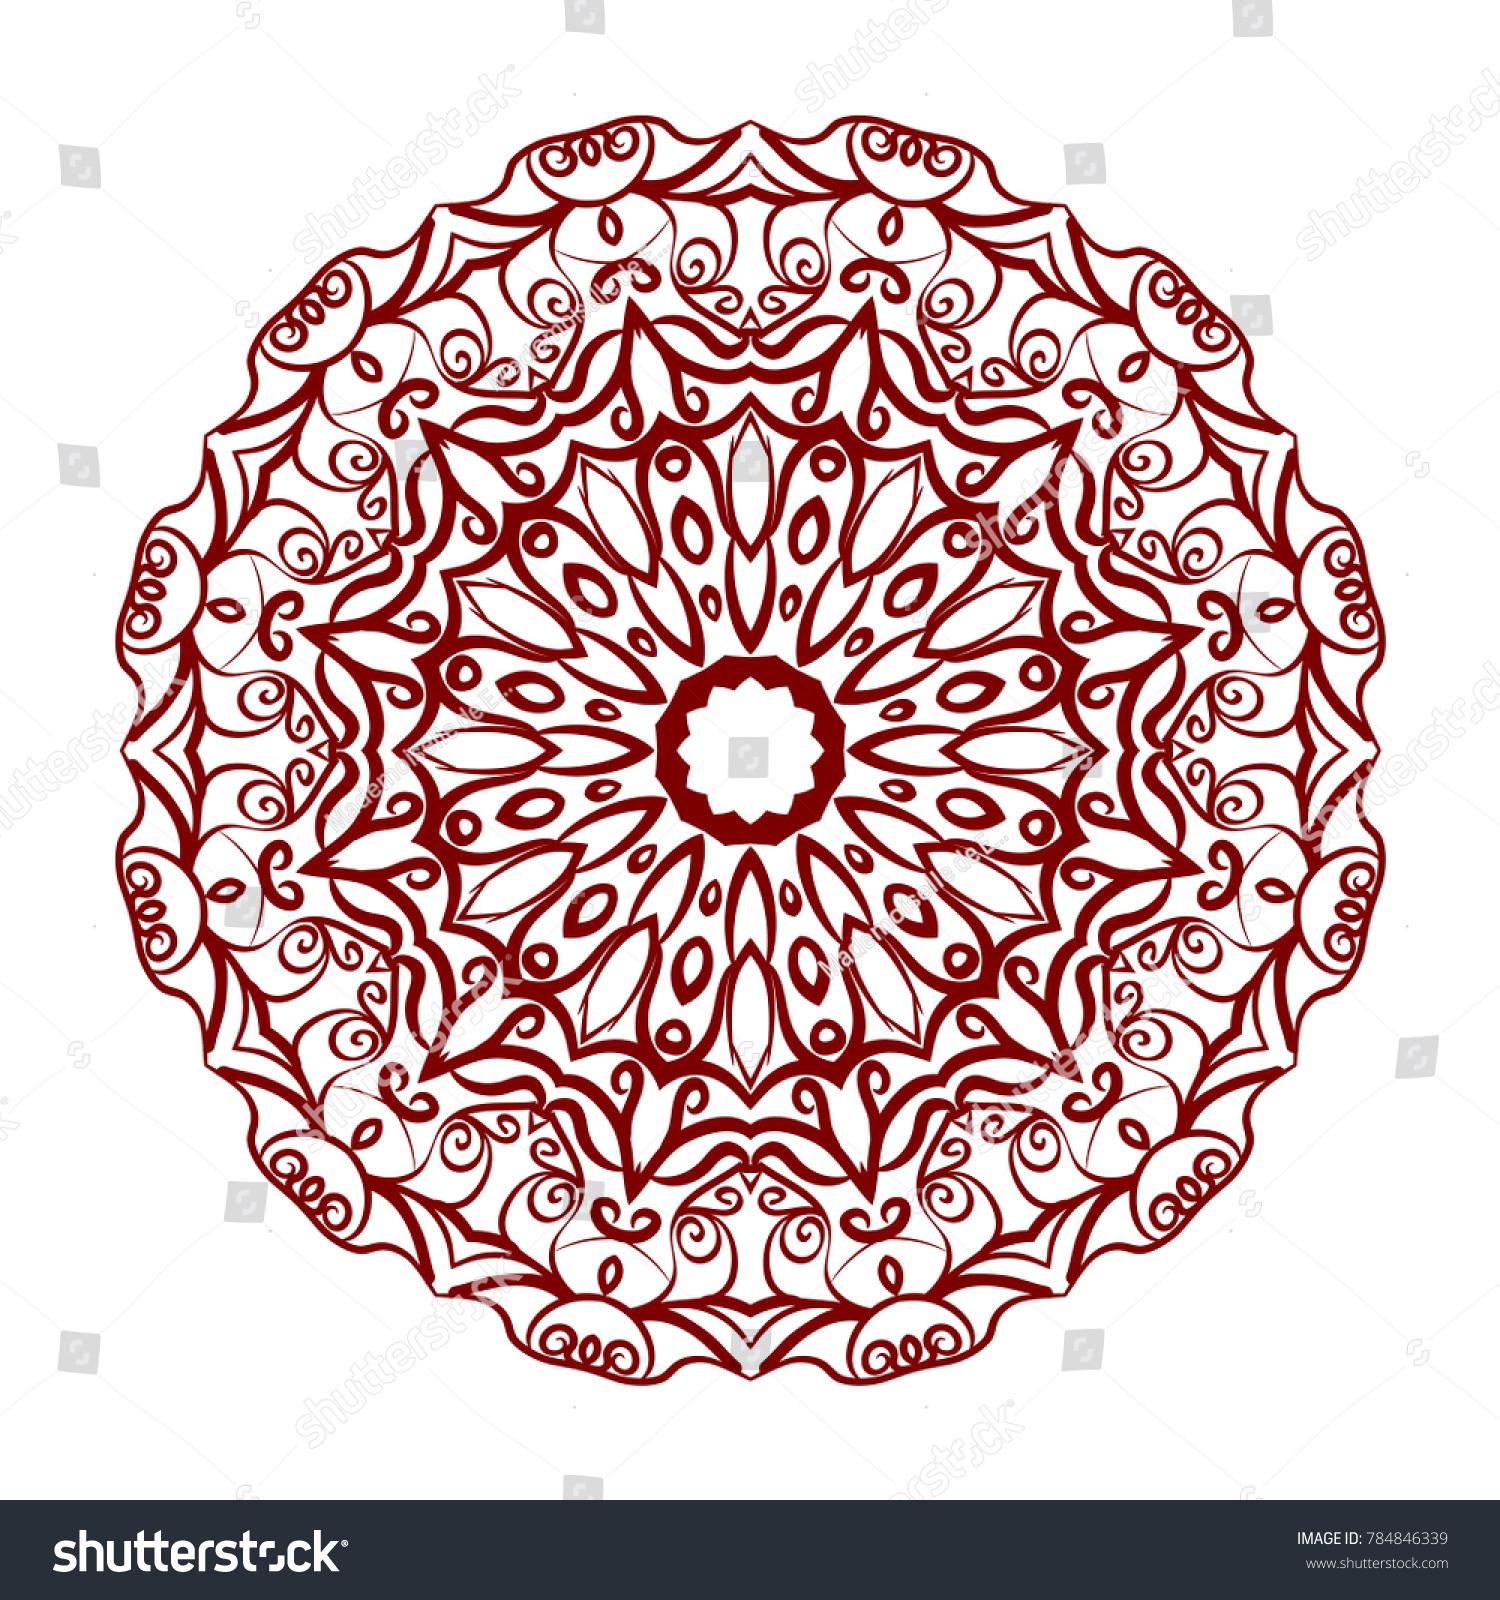 Abstract Flower Design Mandala Decorative Round Stock Vector ...